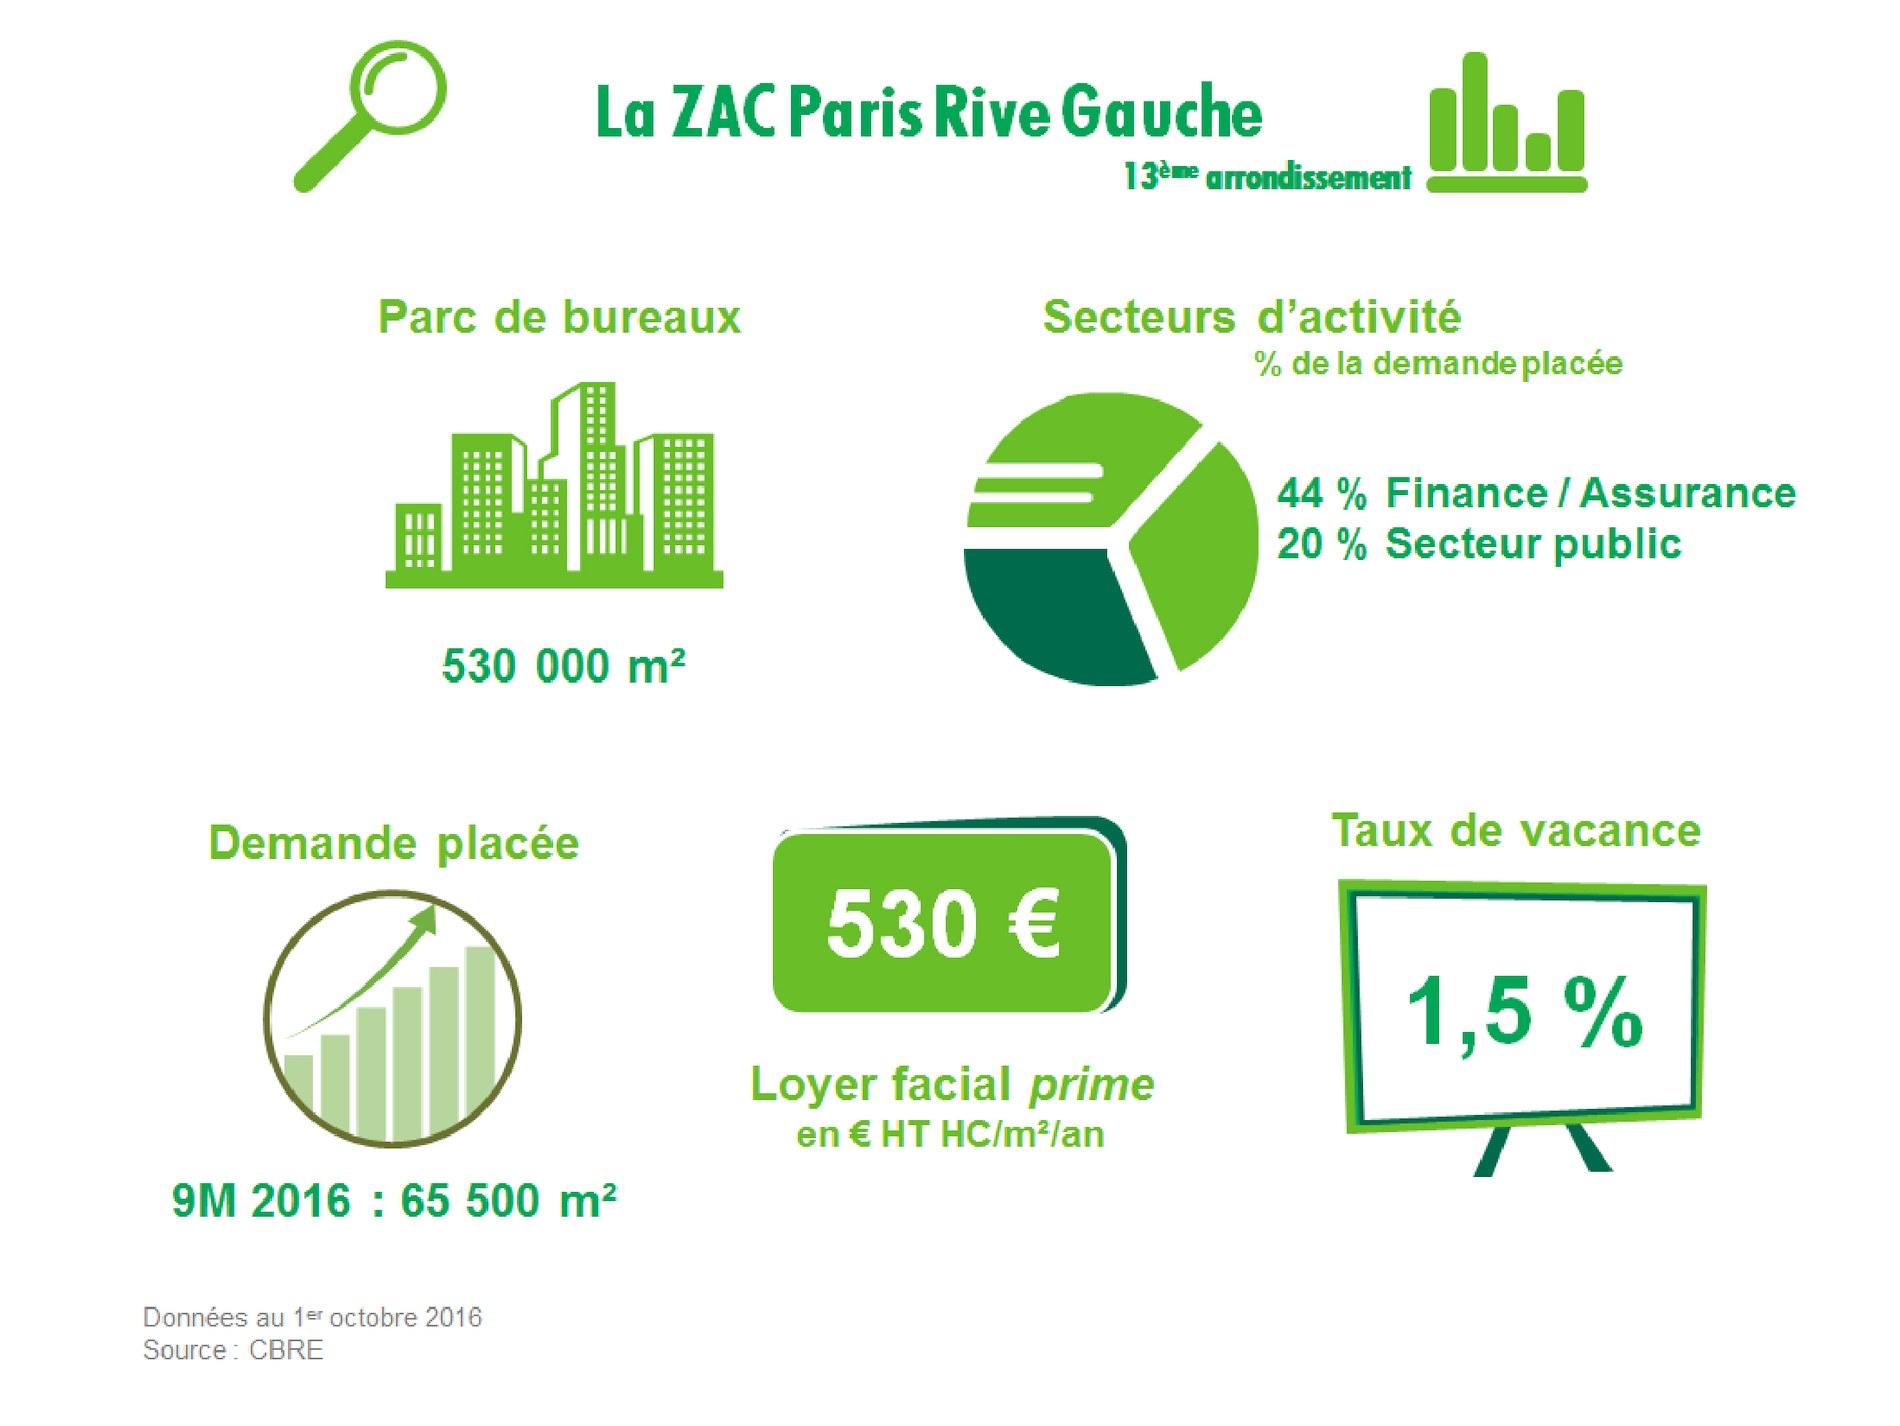 La ZAC Paris Rive Gauche by CBRE